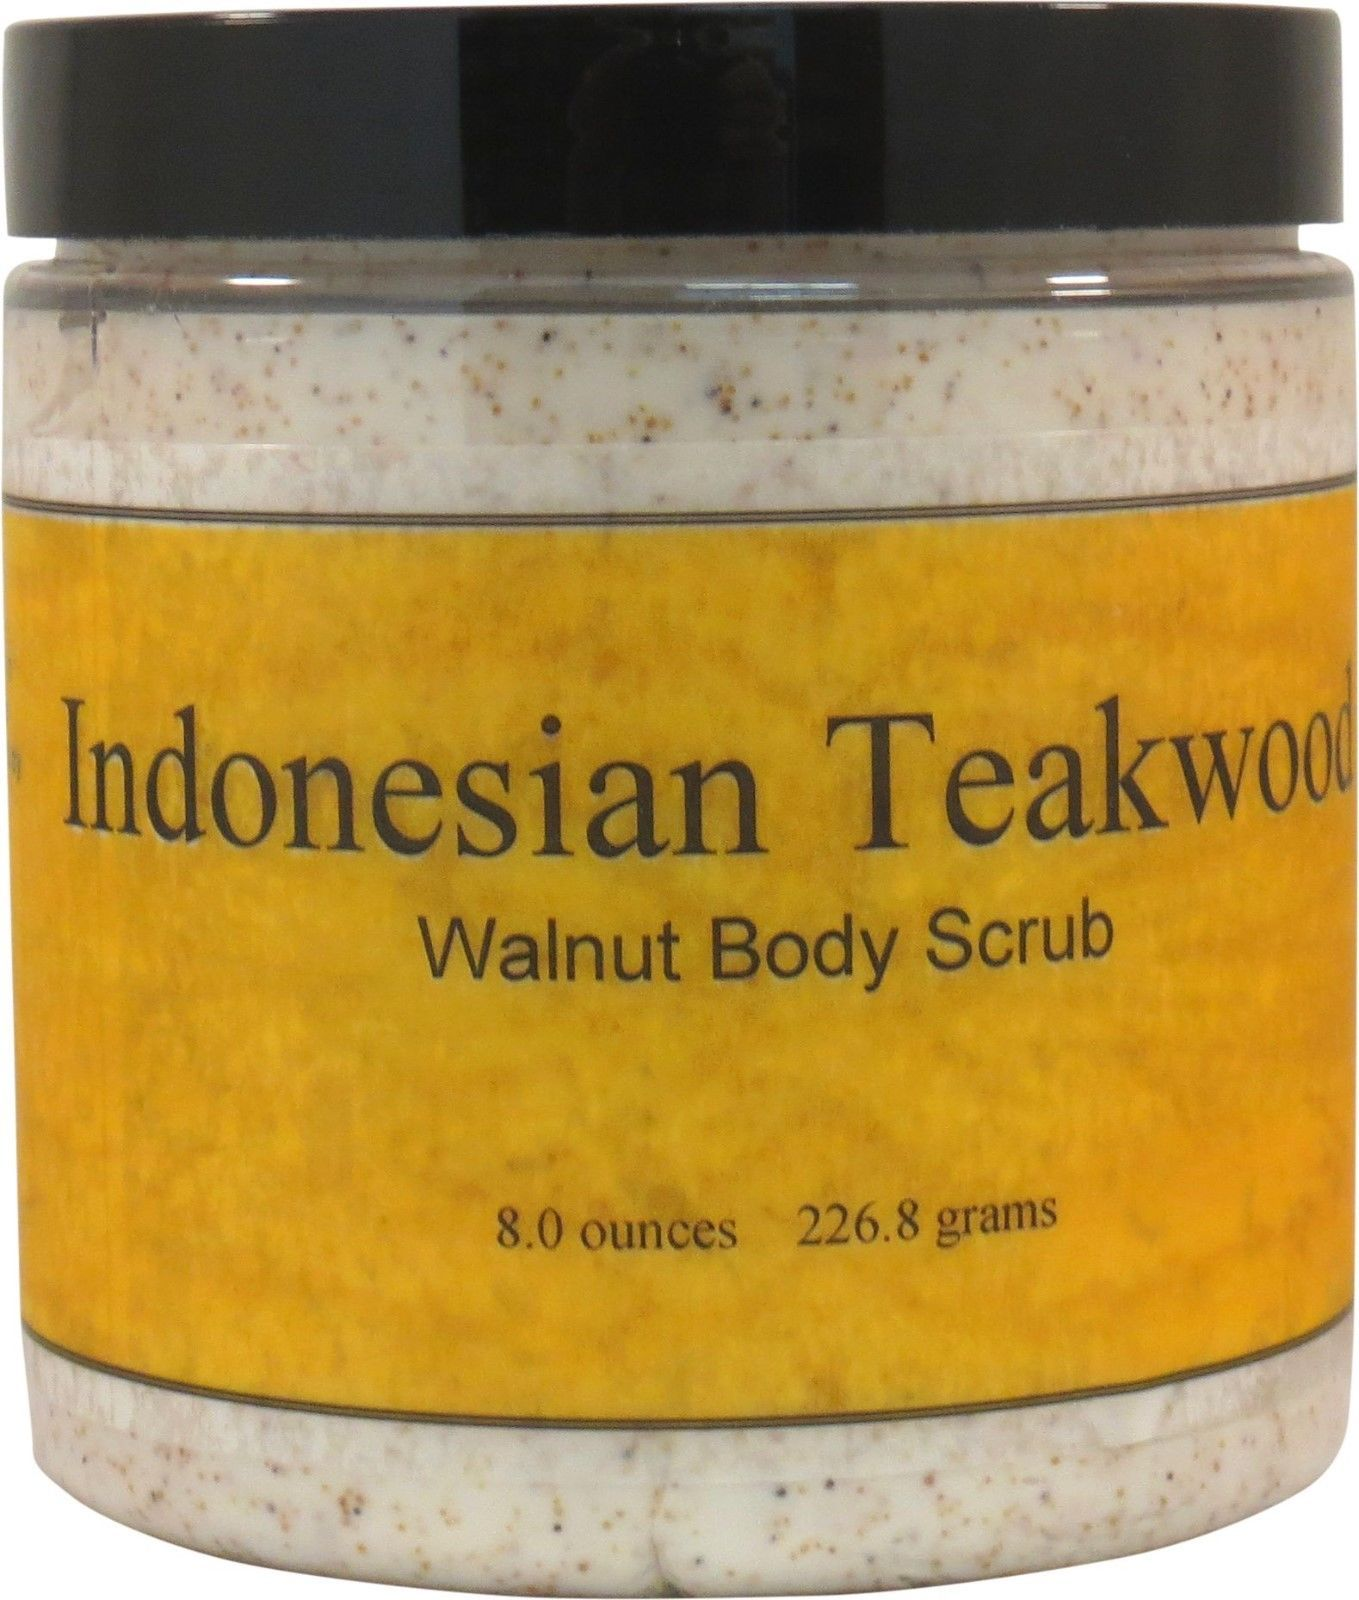 Indonesian Teakwood Walnut Body Scrub